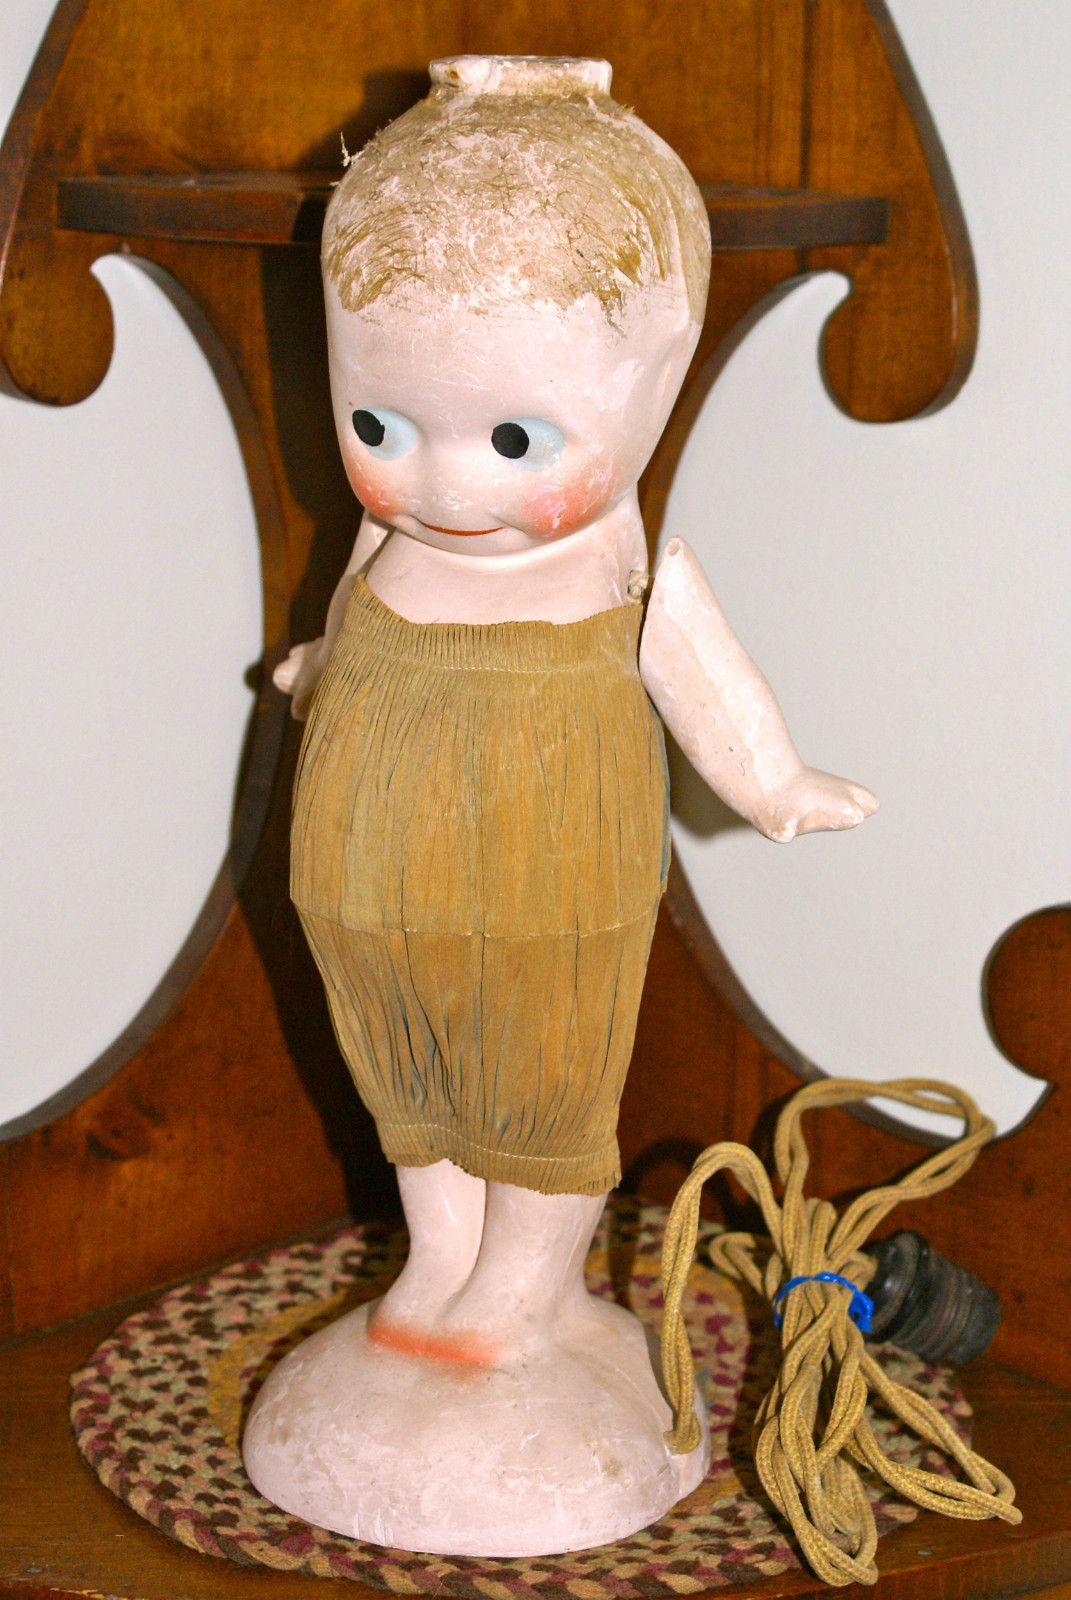 Amazing RARE 1920u0027s Chalkware Kewpie Doll Lamp 13 5 Inches Tall Paper Dress   EBay